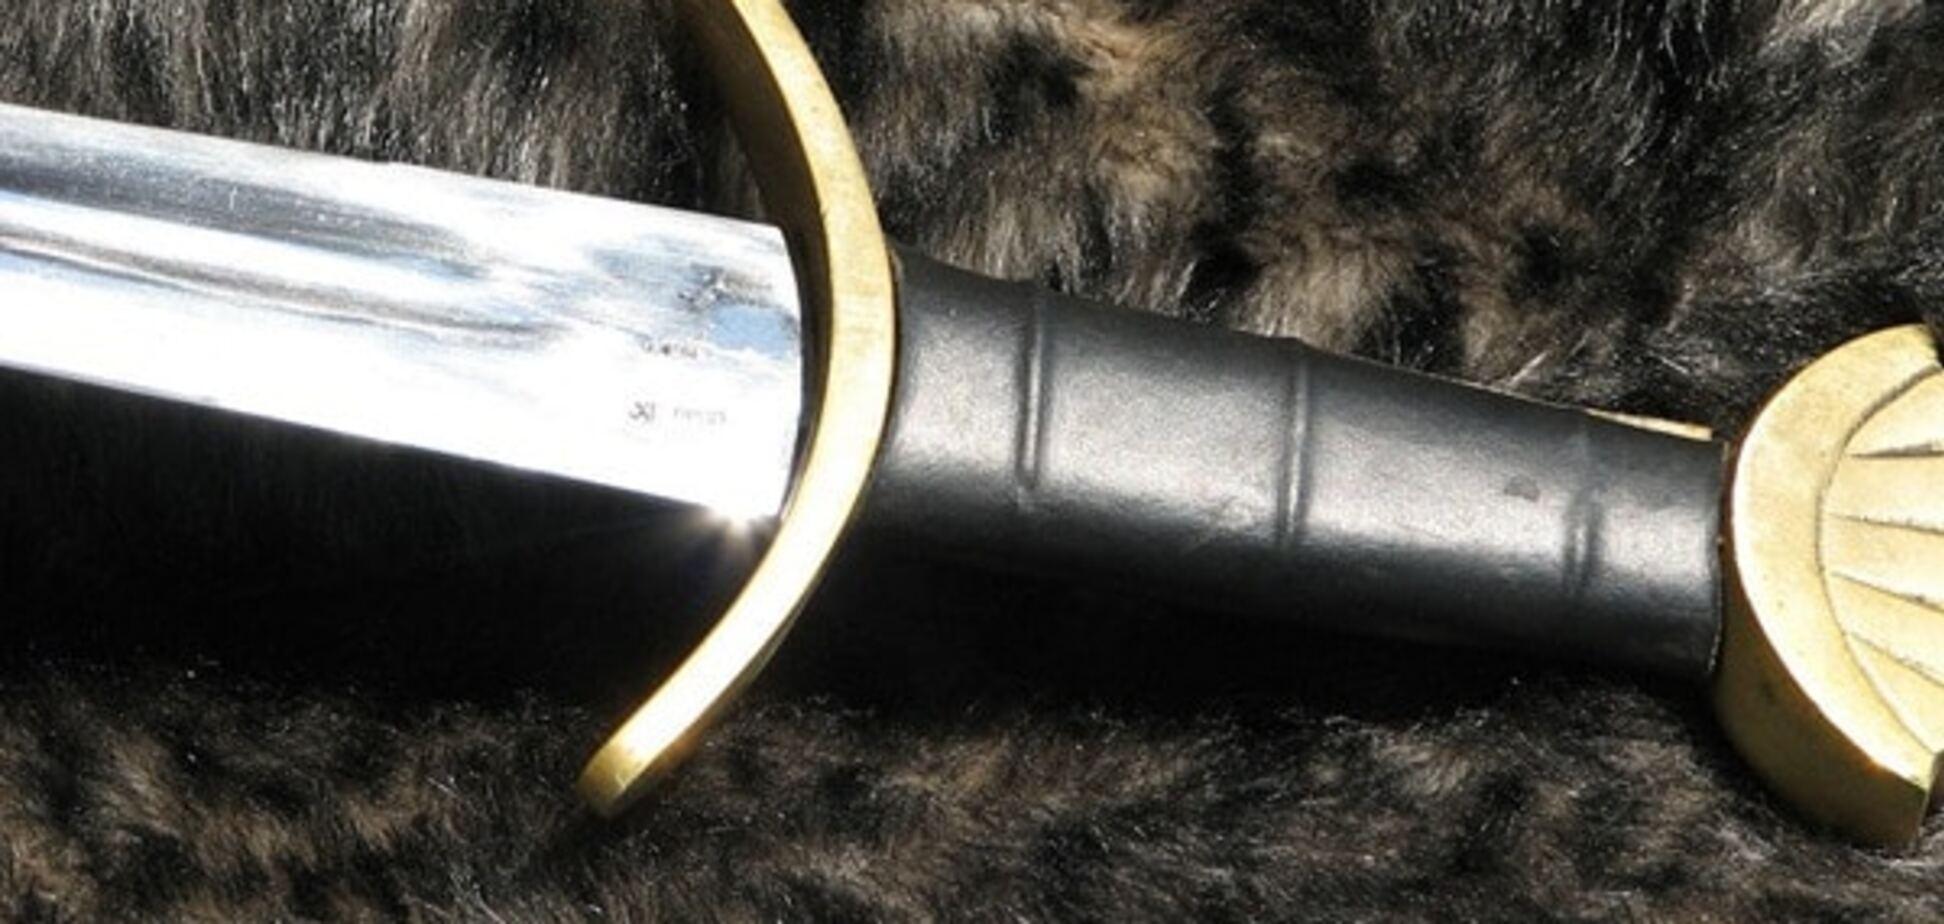 Меч эпохи викингов